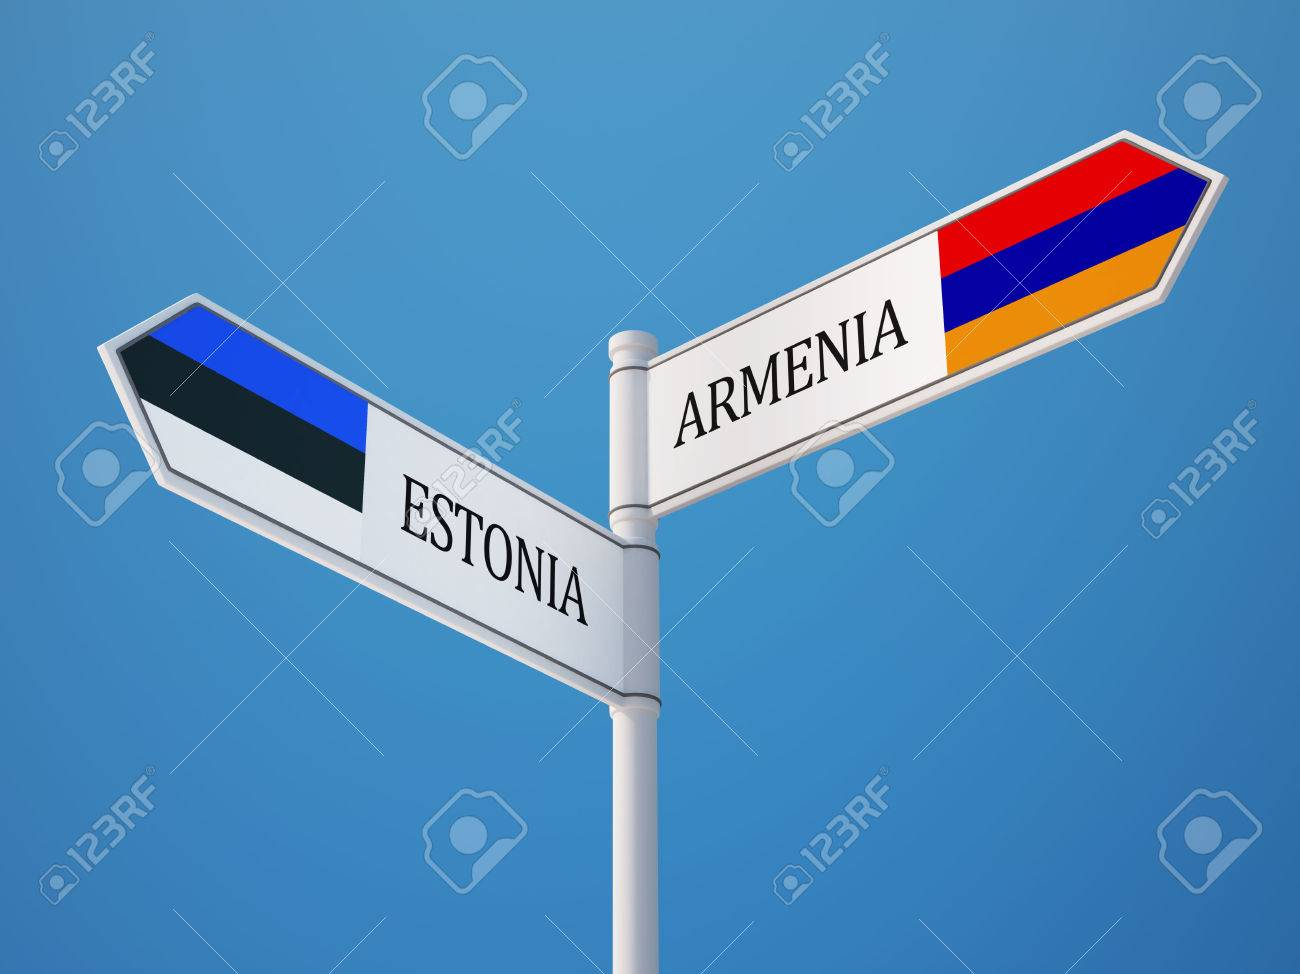 http://previews.123rf.com/images/xtockimages/xtockimages1406/xtockimages140632534/29196145-Estonia-Armenia-High-Resolution-Sign-Flags-Concept-Stock-Photo.jpg